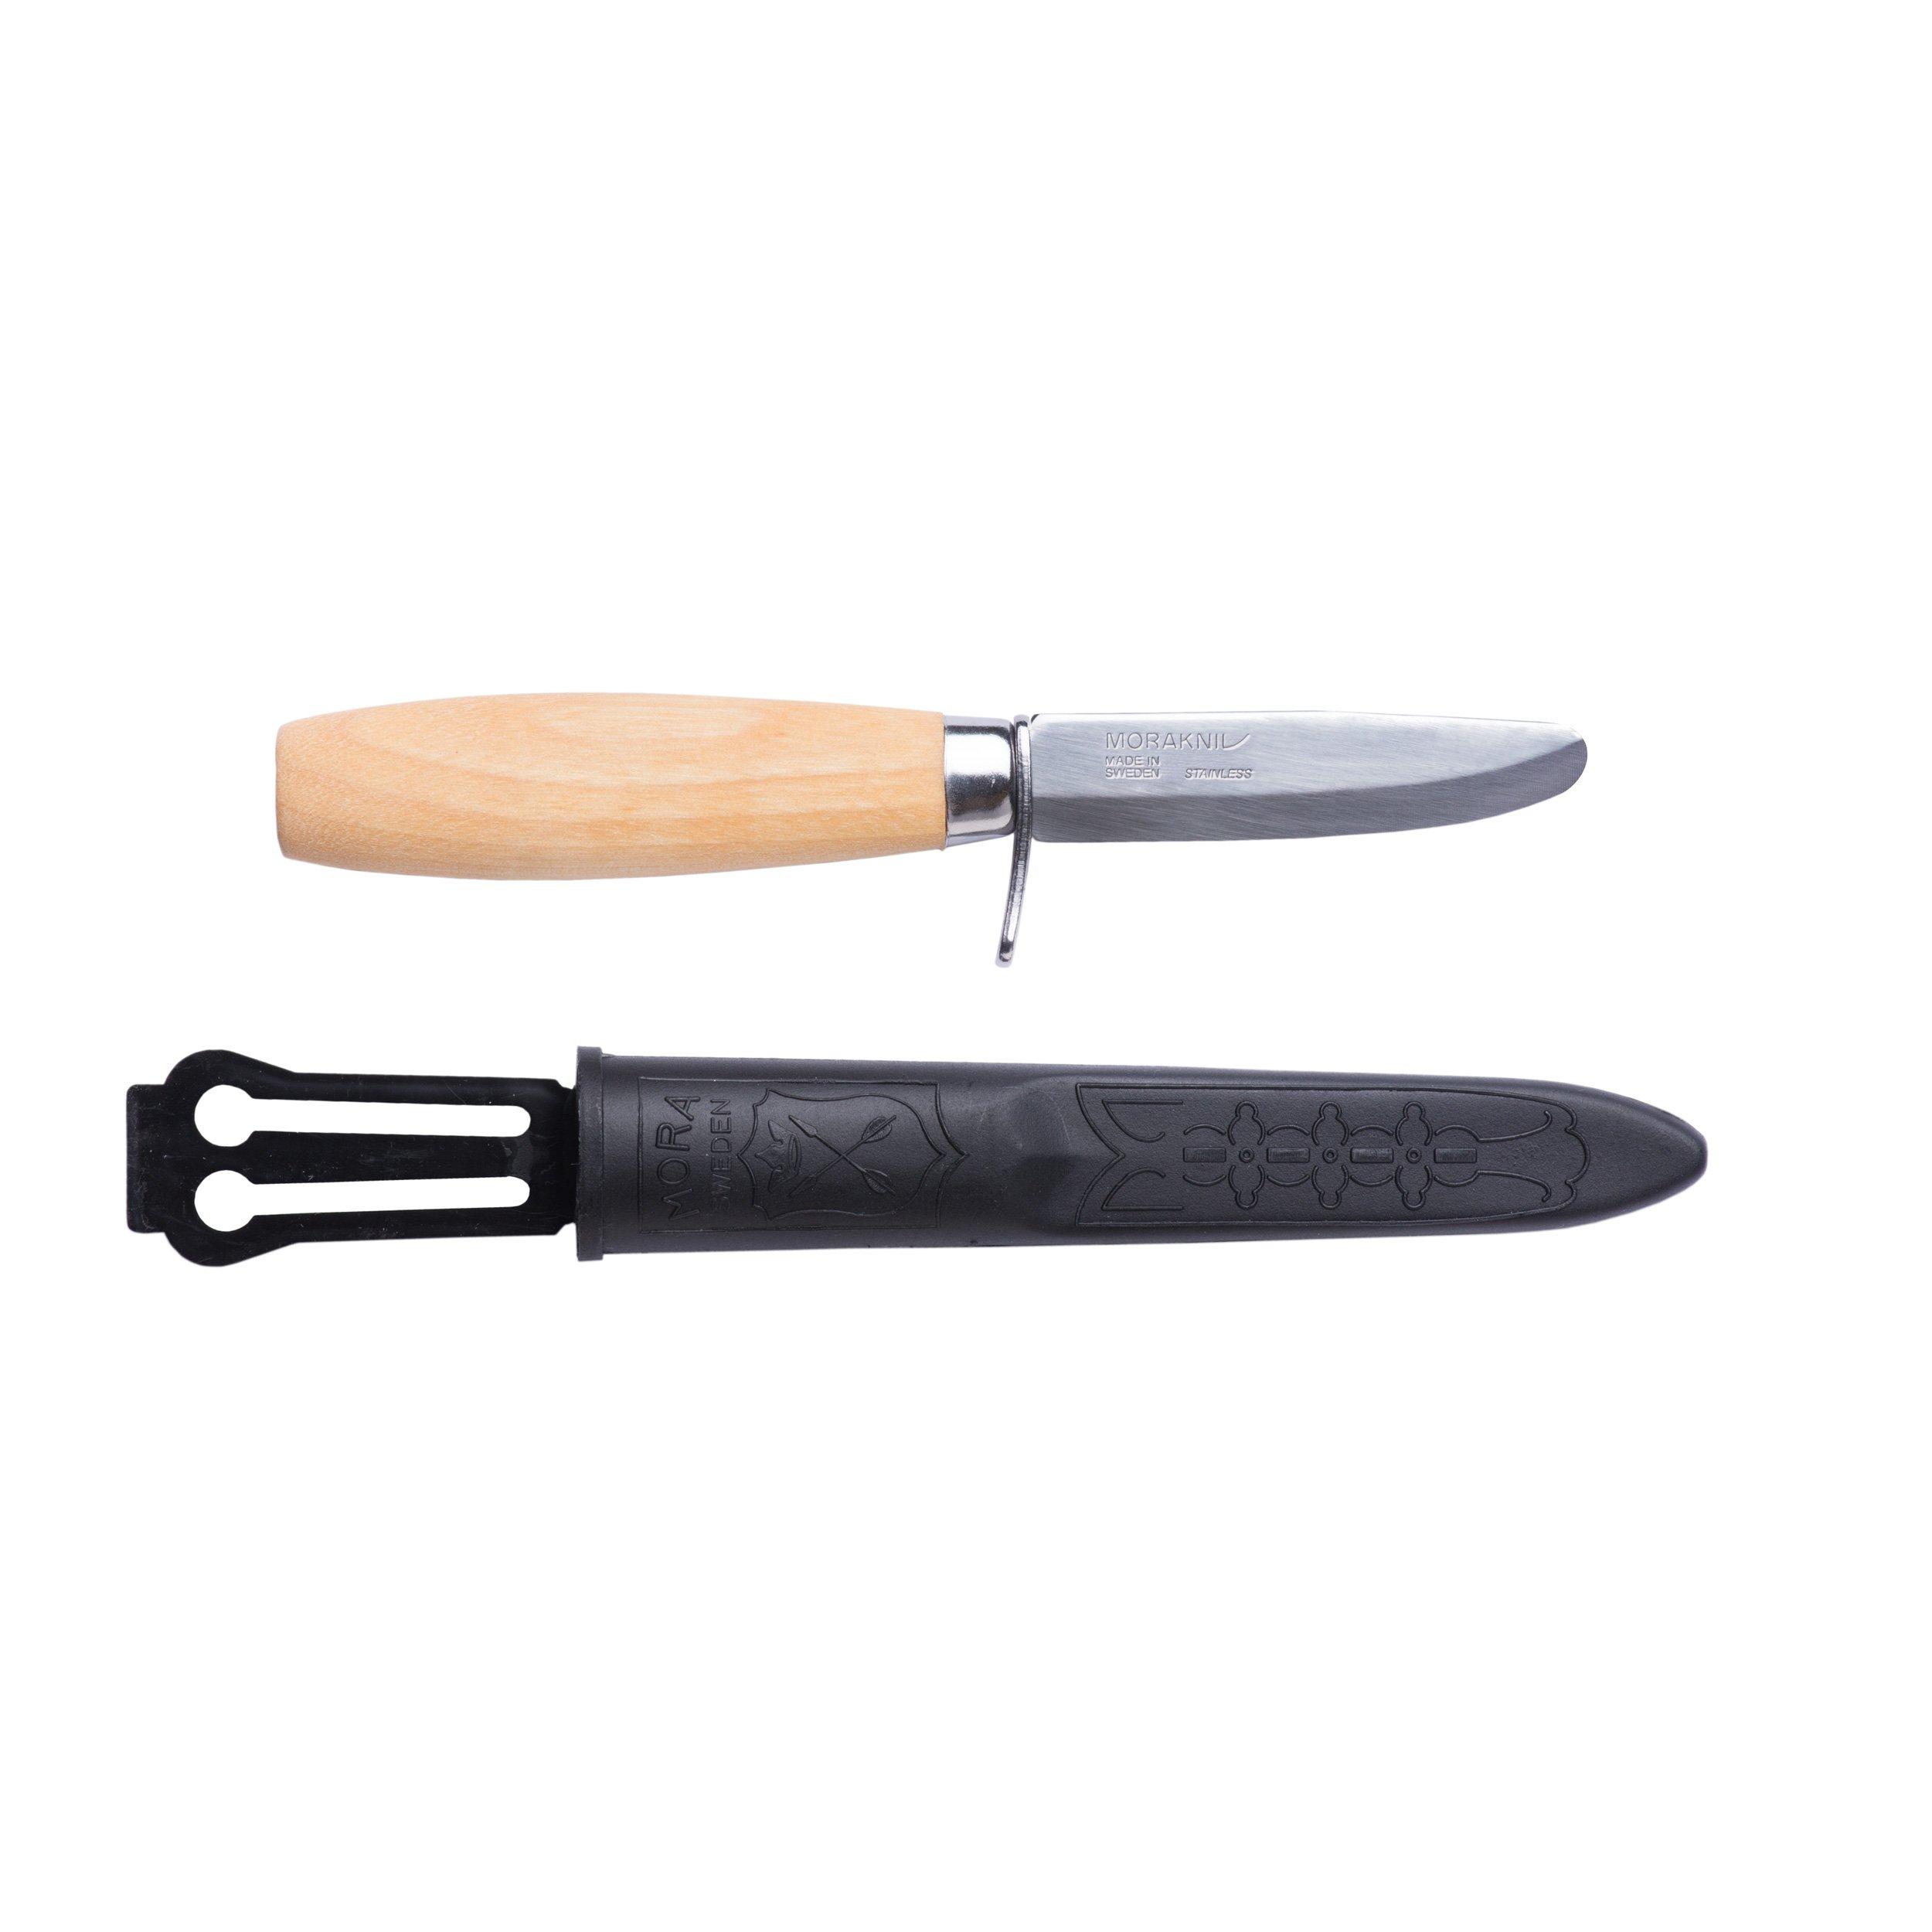 Morakniv Rookie Fixed Blade Safe Knife for Kids with Blunt Tip